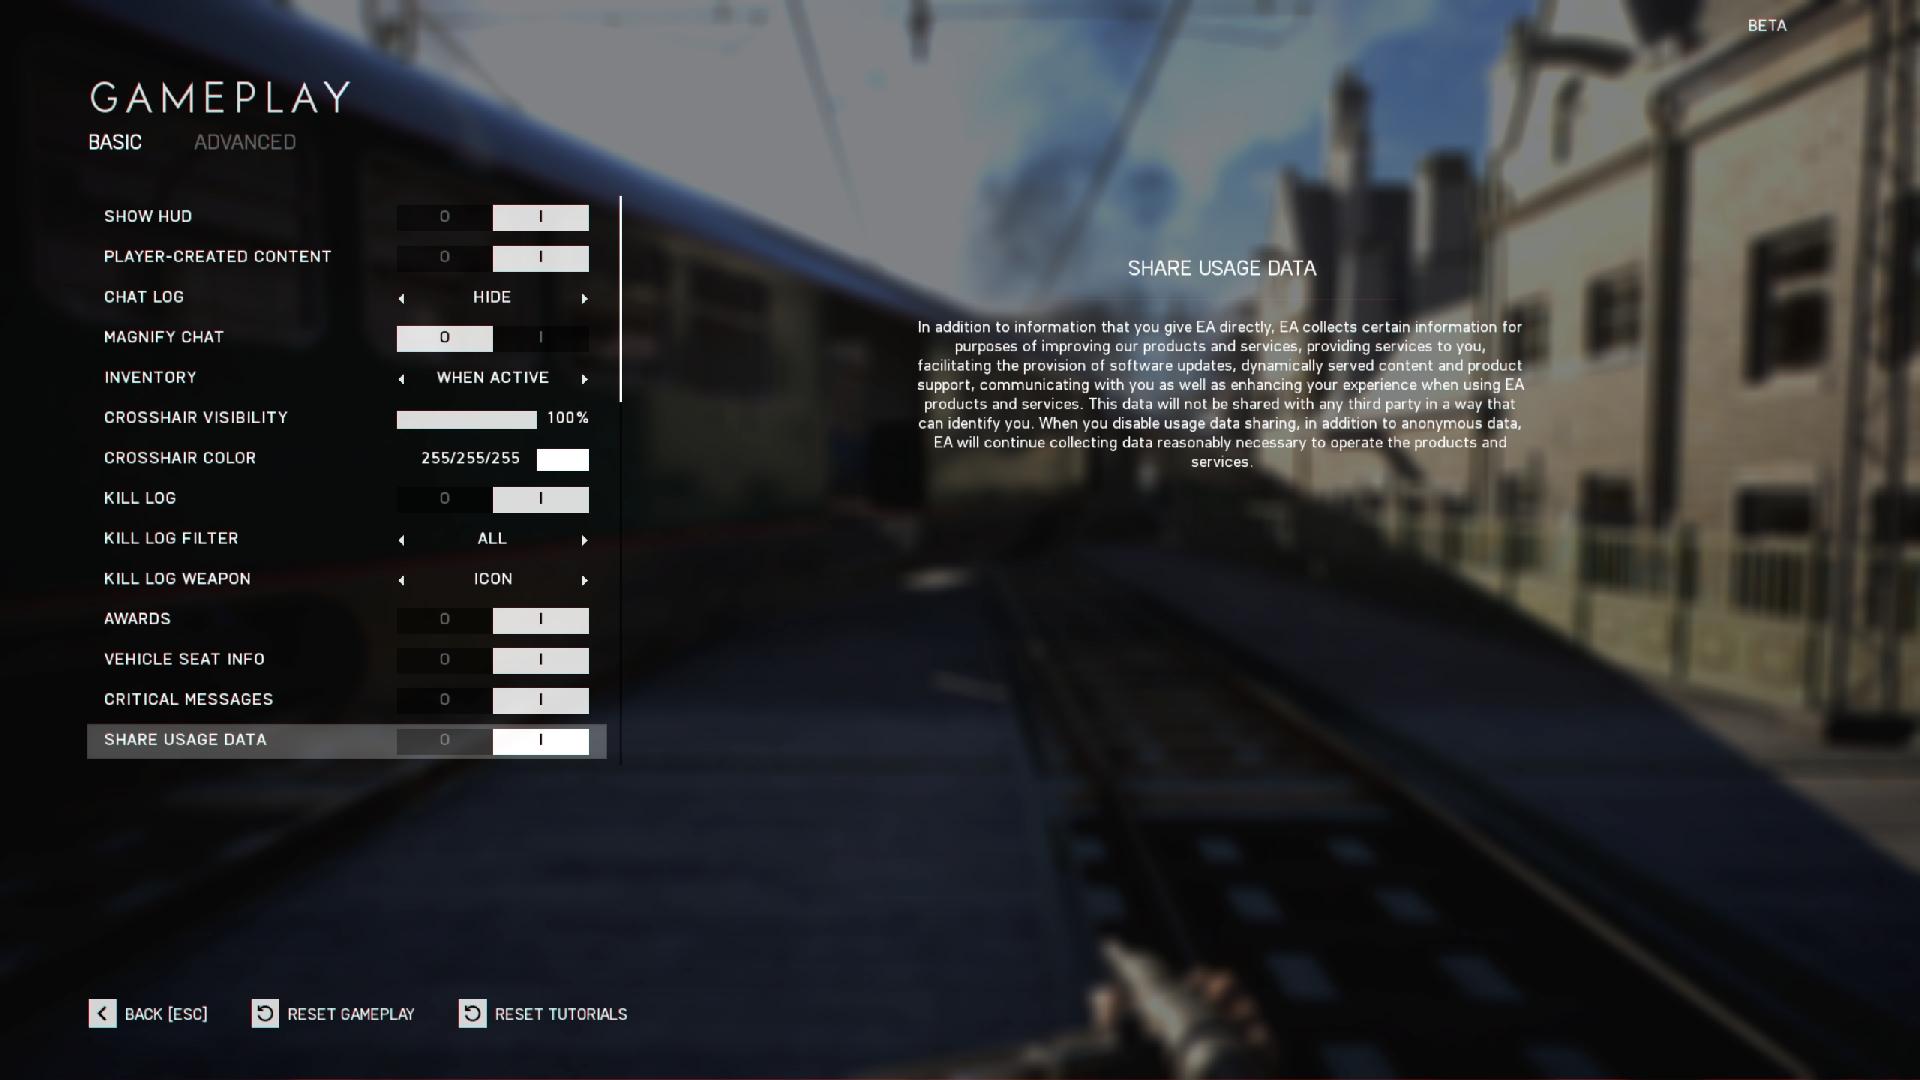 Battlefield V Beta – Gamescom Screenshot (14)